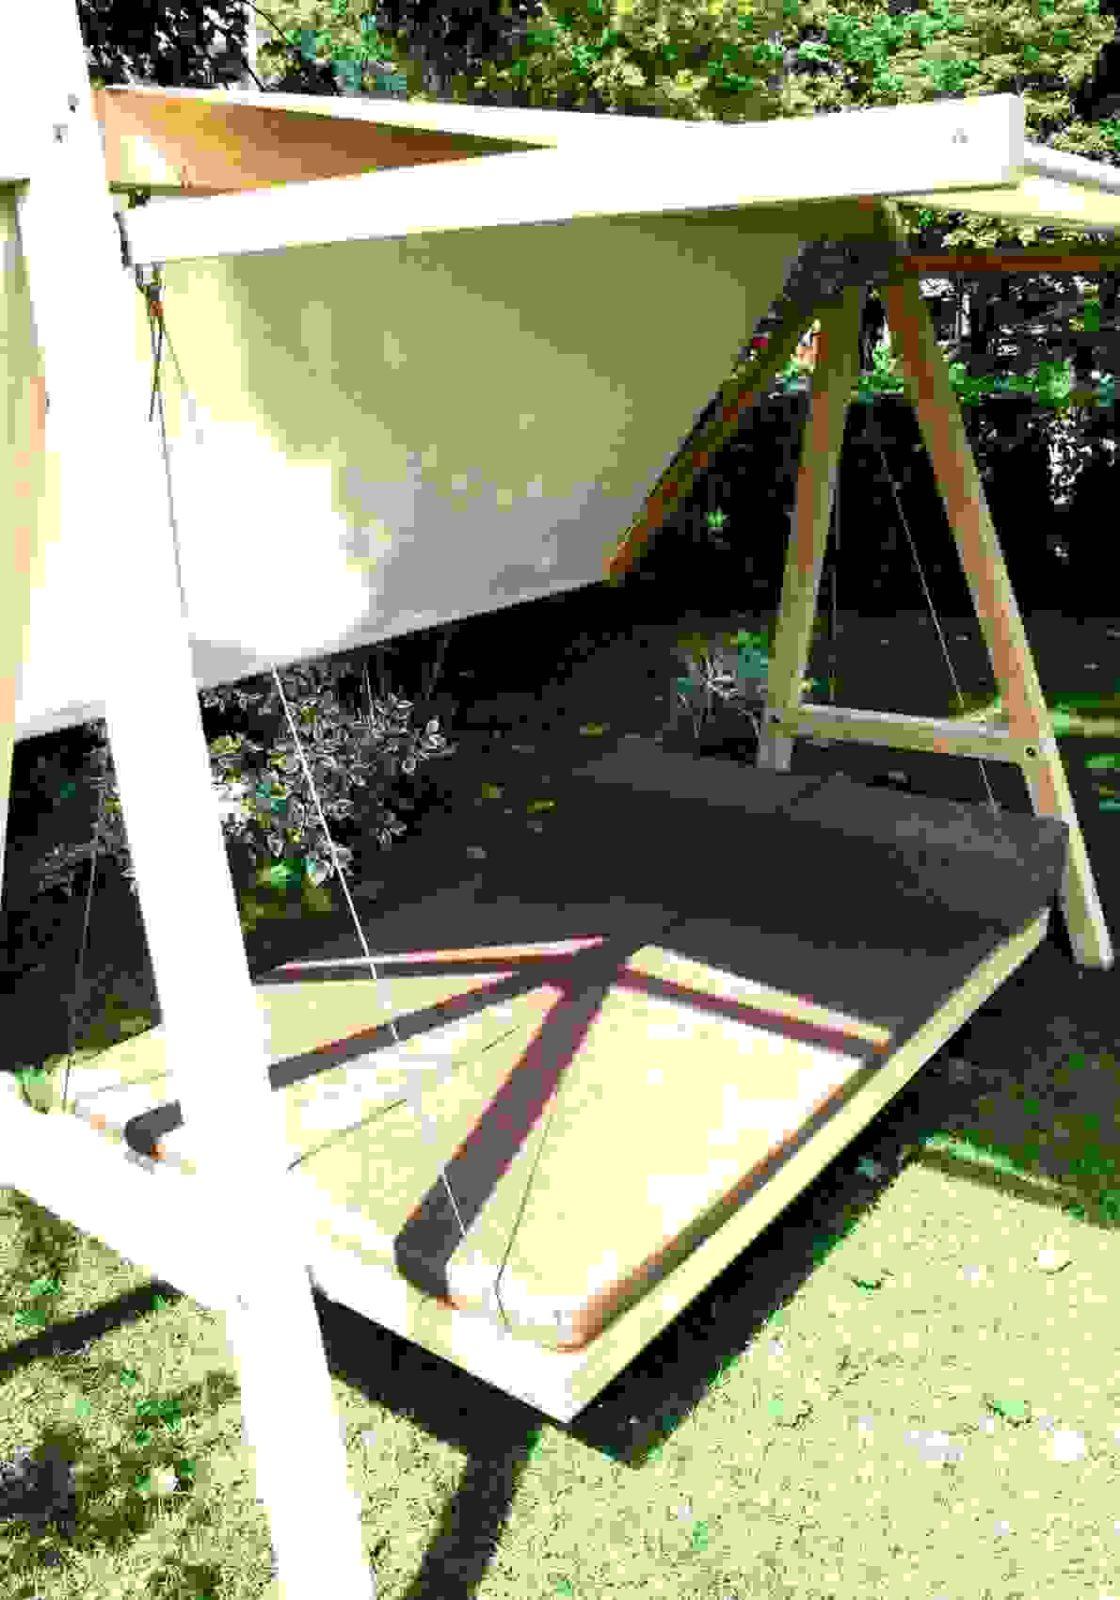 Hollywoodschaukel Ikea Gebraucht Selber Bauen Holz Von von Hollywoodschaukel Holz Selber Bauen Photo